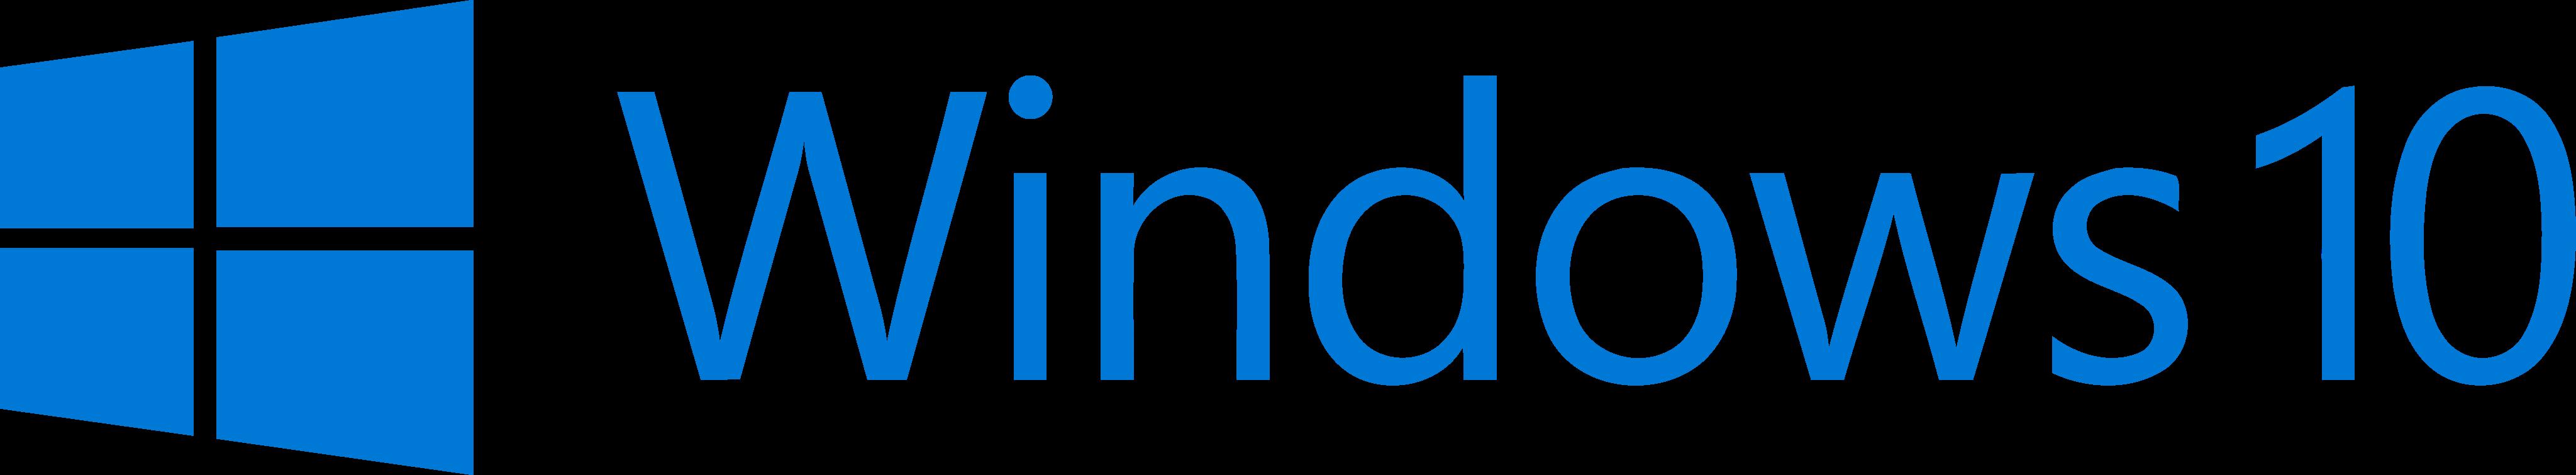 windows 10 logo 1 1 - Windows 10 Logo